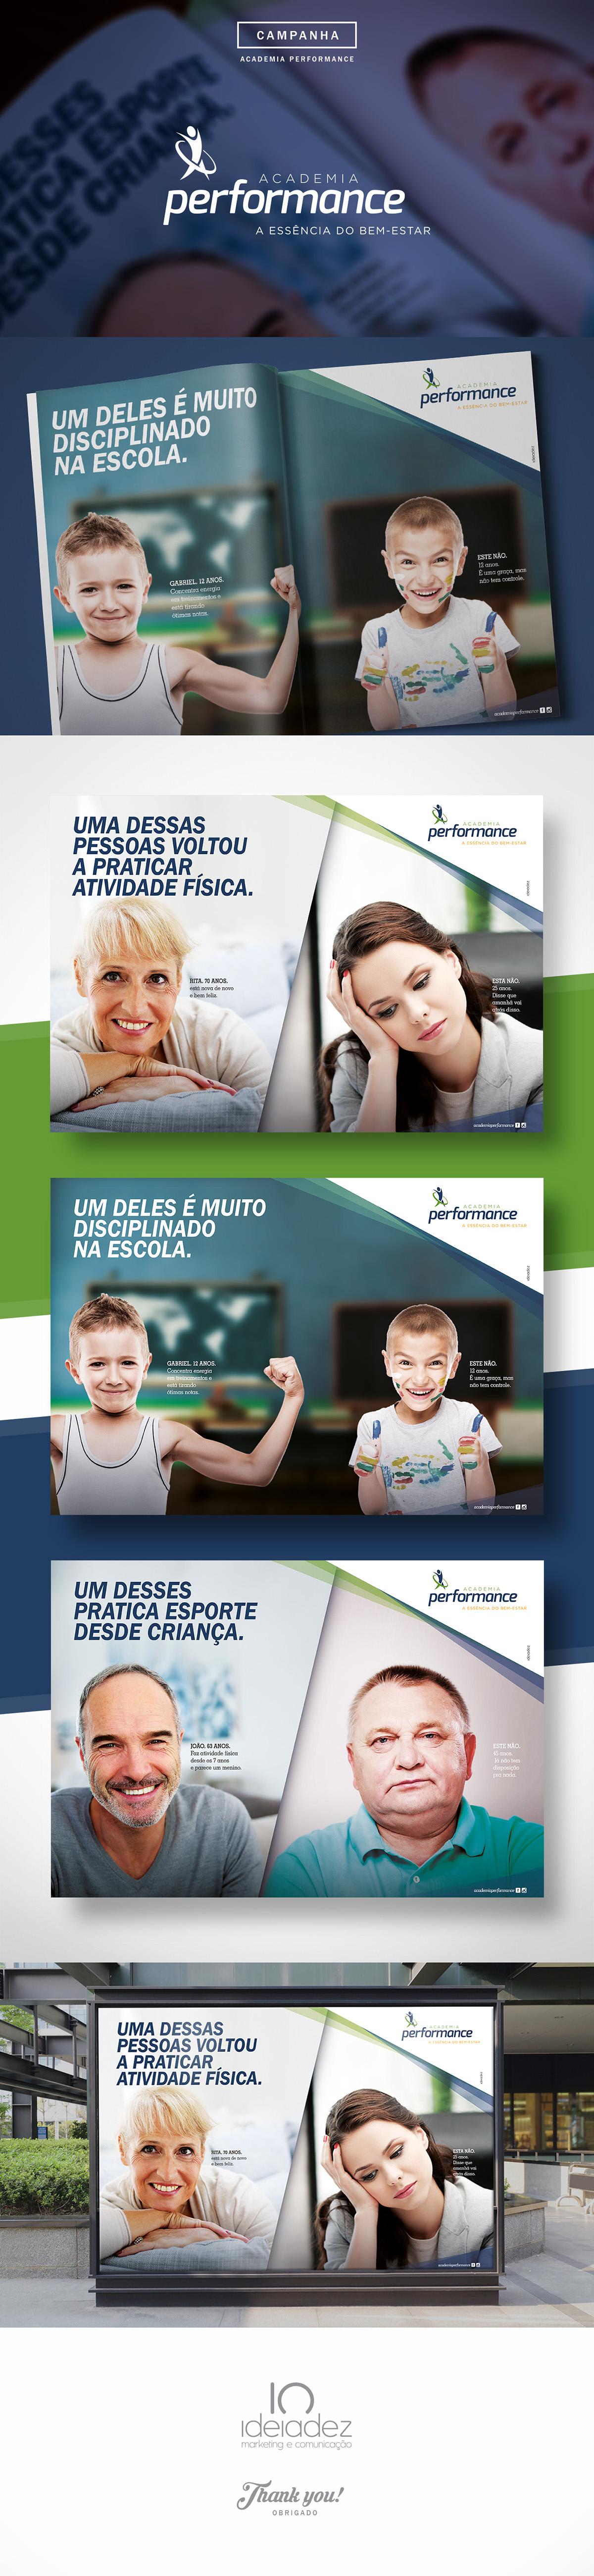 gym academia fitness saúde Health healthy idade Ideia10 Ideia Performance